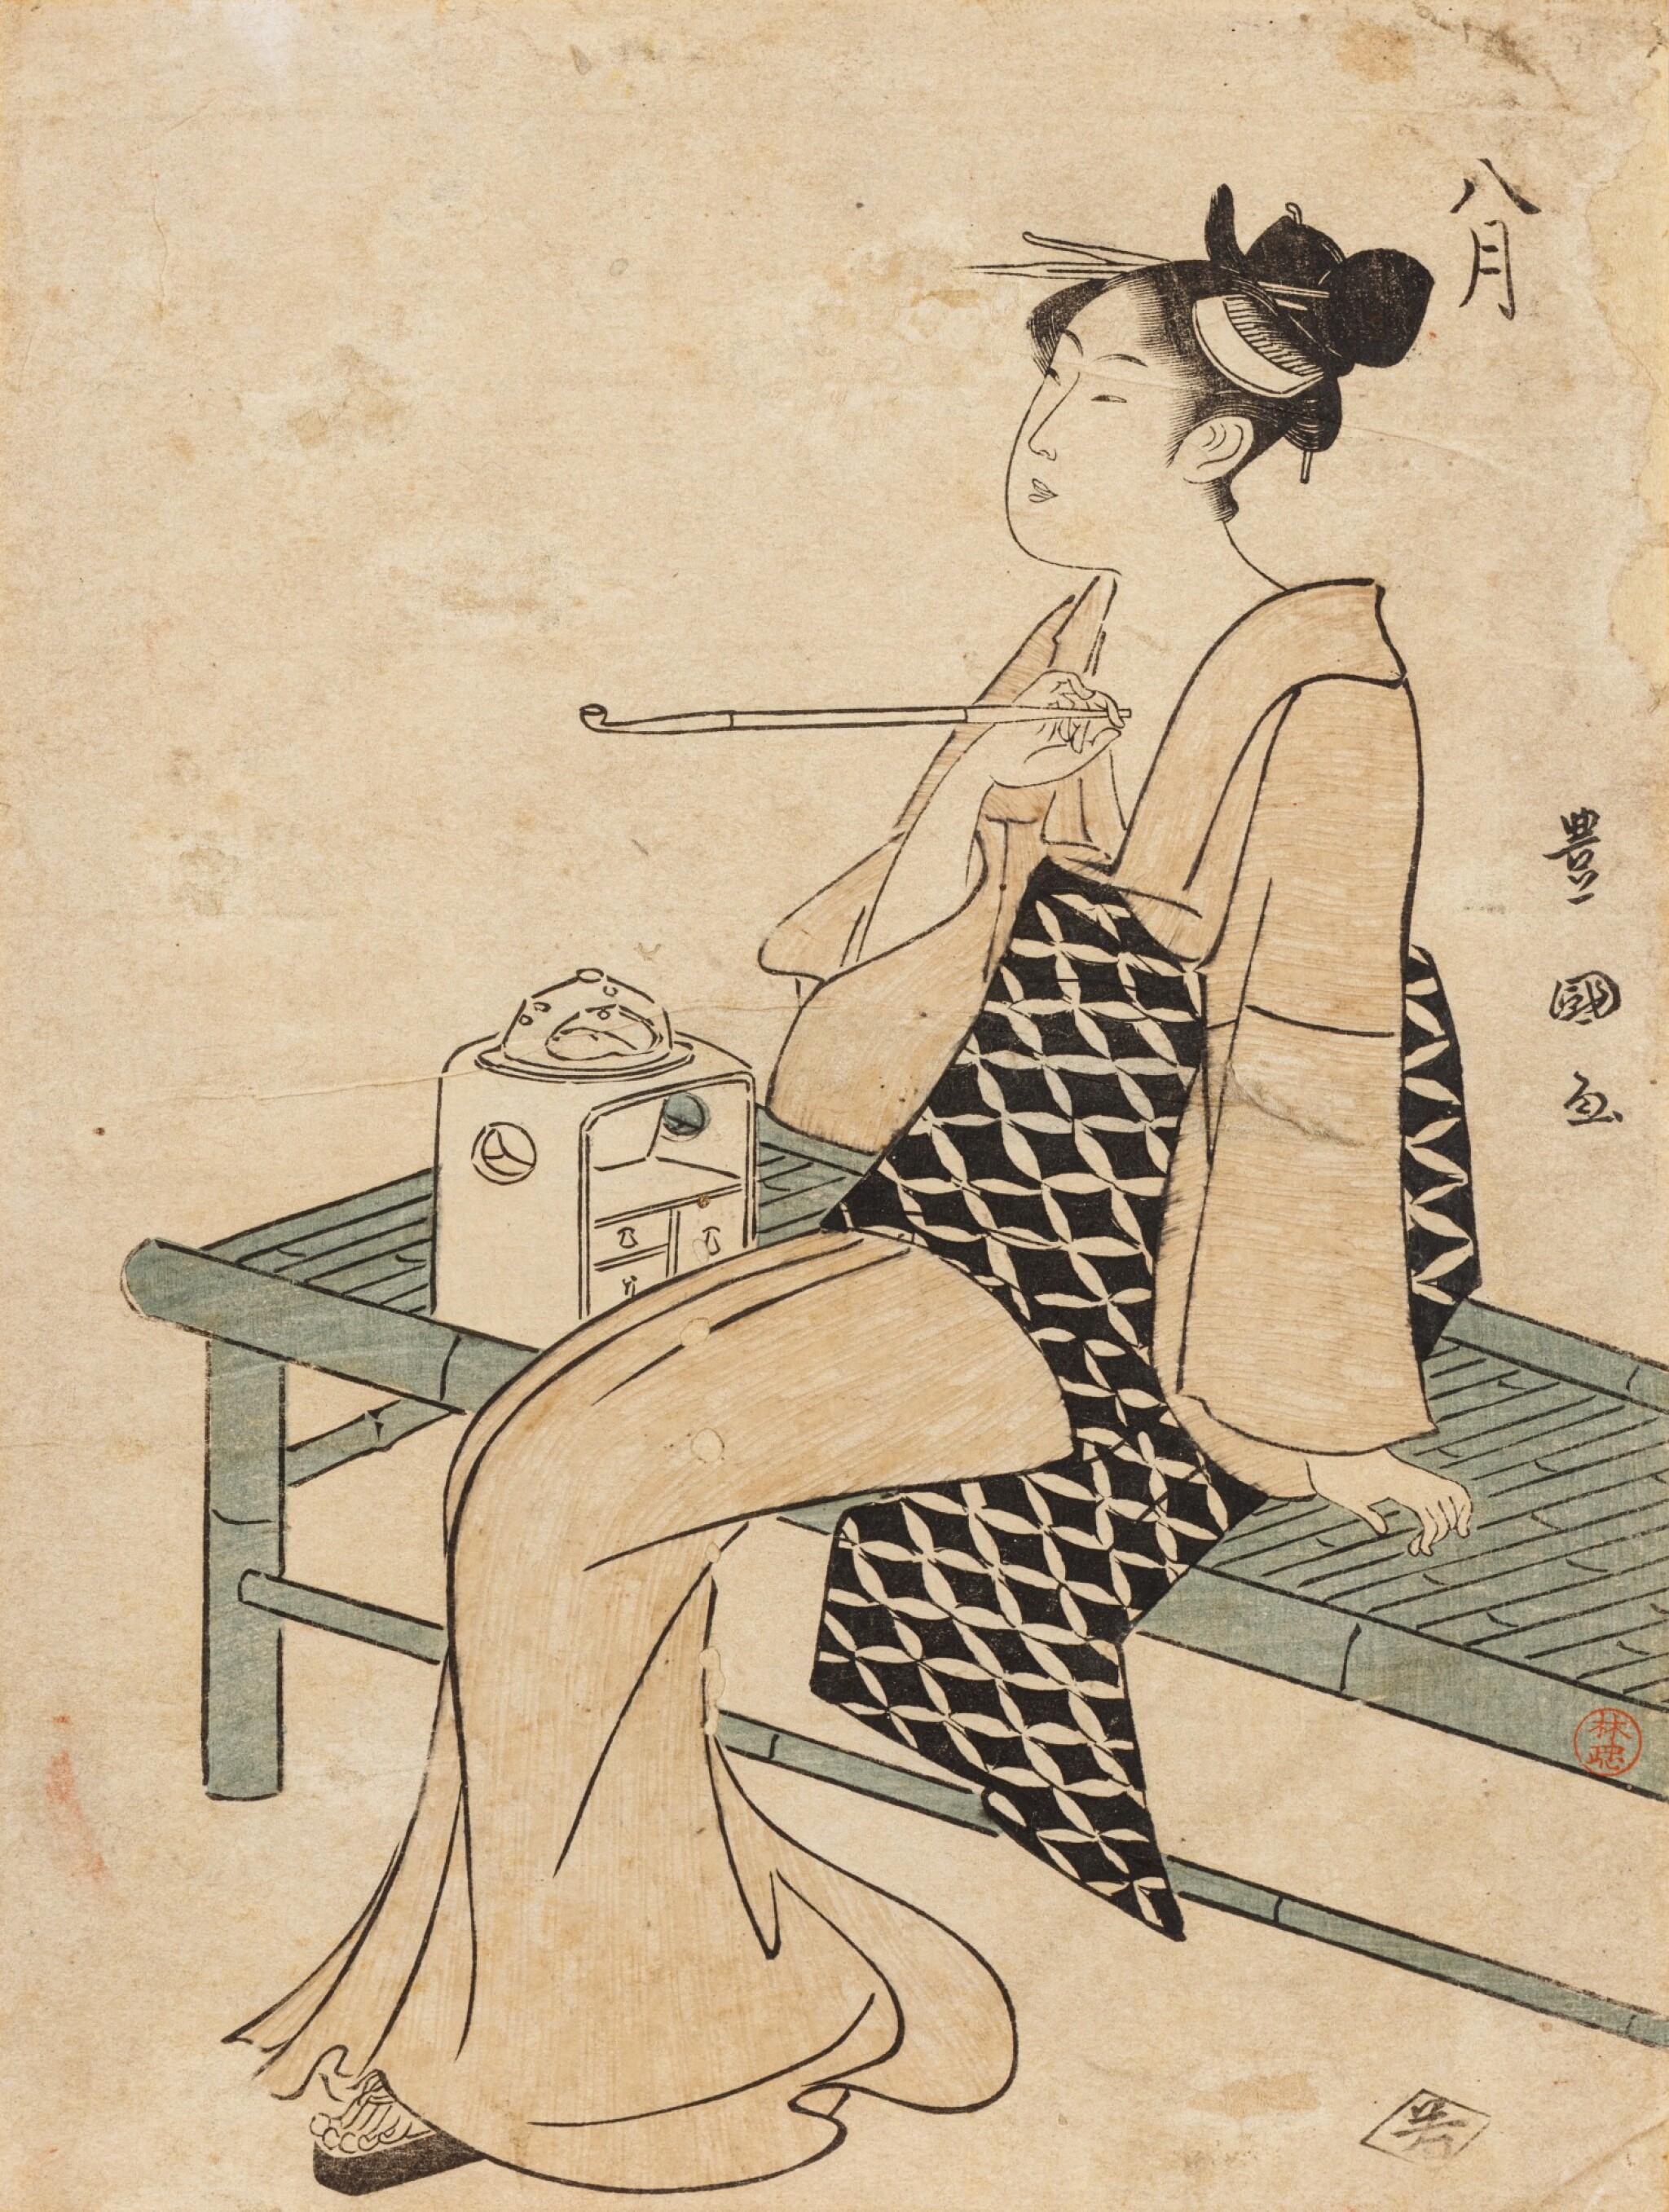 View 1 of Lot 271. Utagawa Toyokuni I Japan Femme fumant sur un banc   Utagawa Toyokuni I, Lady smoking seated on a bench, Japan   日本 歌川豊国 《八月》  Utagawa Toyokuni I, Lady smoking seated on a bench, Japan.